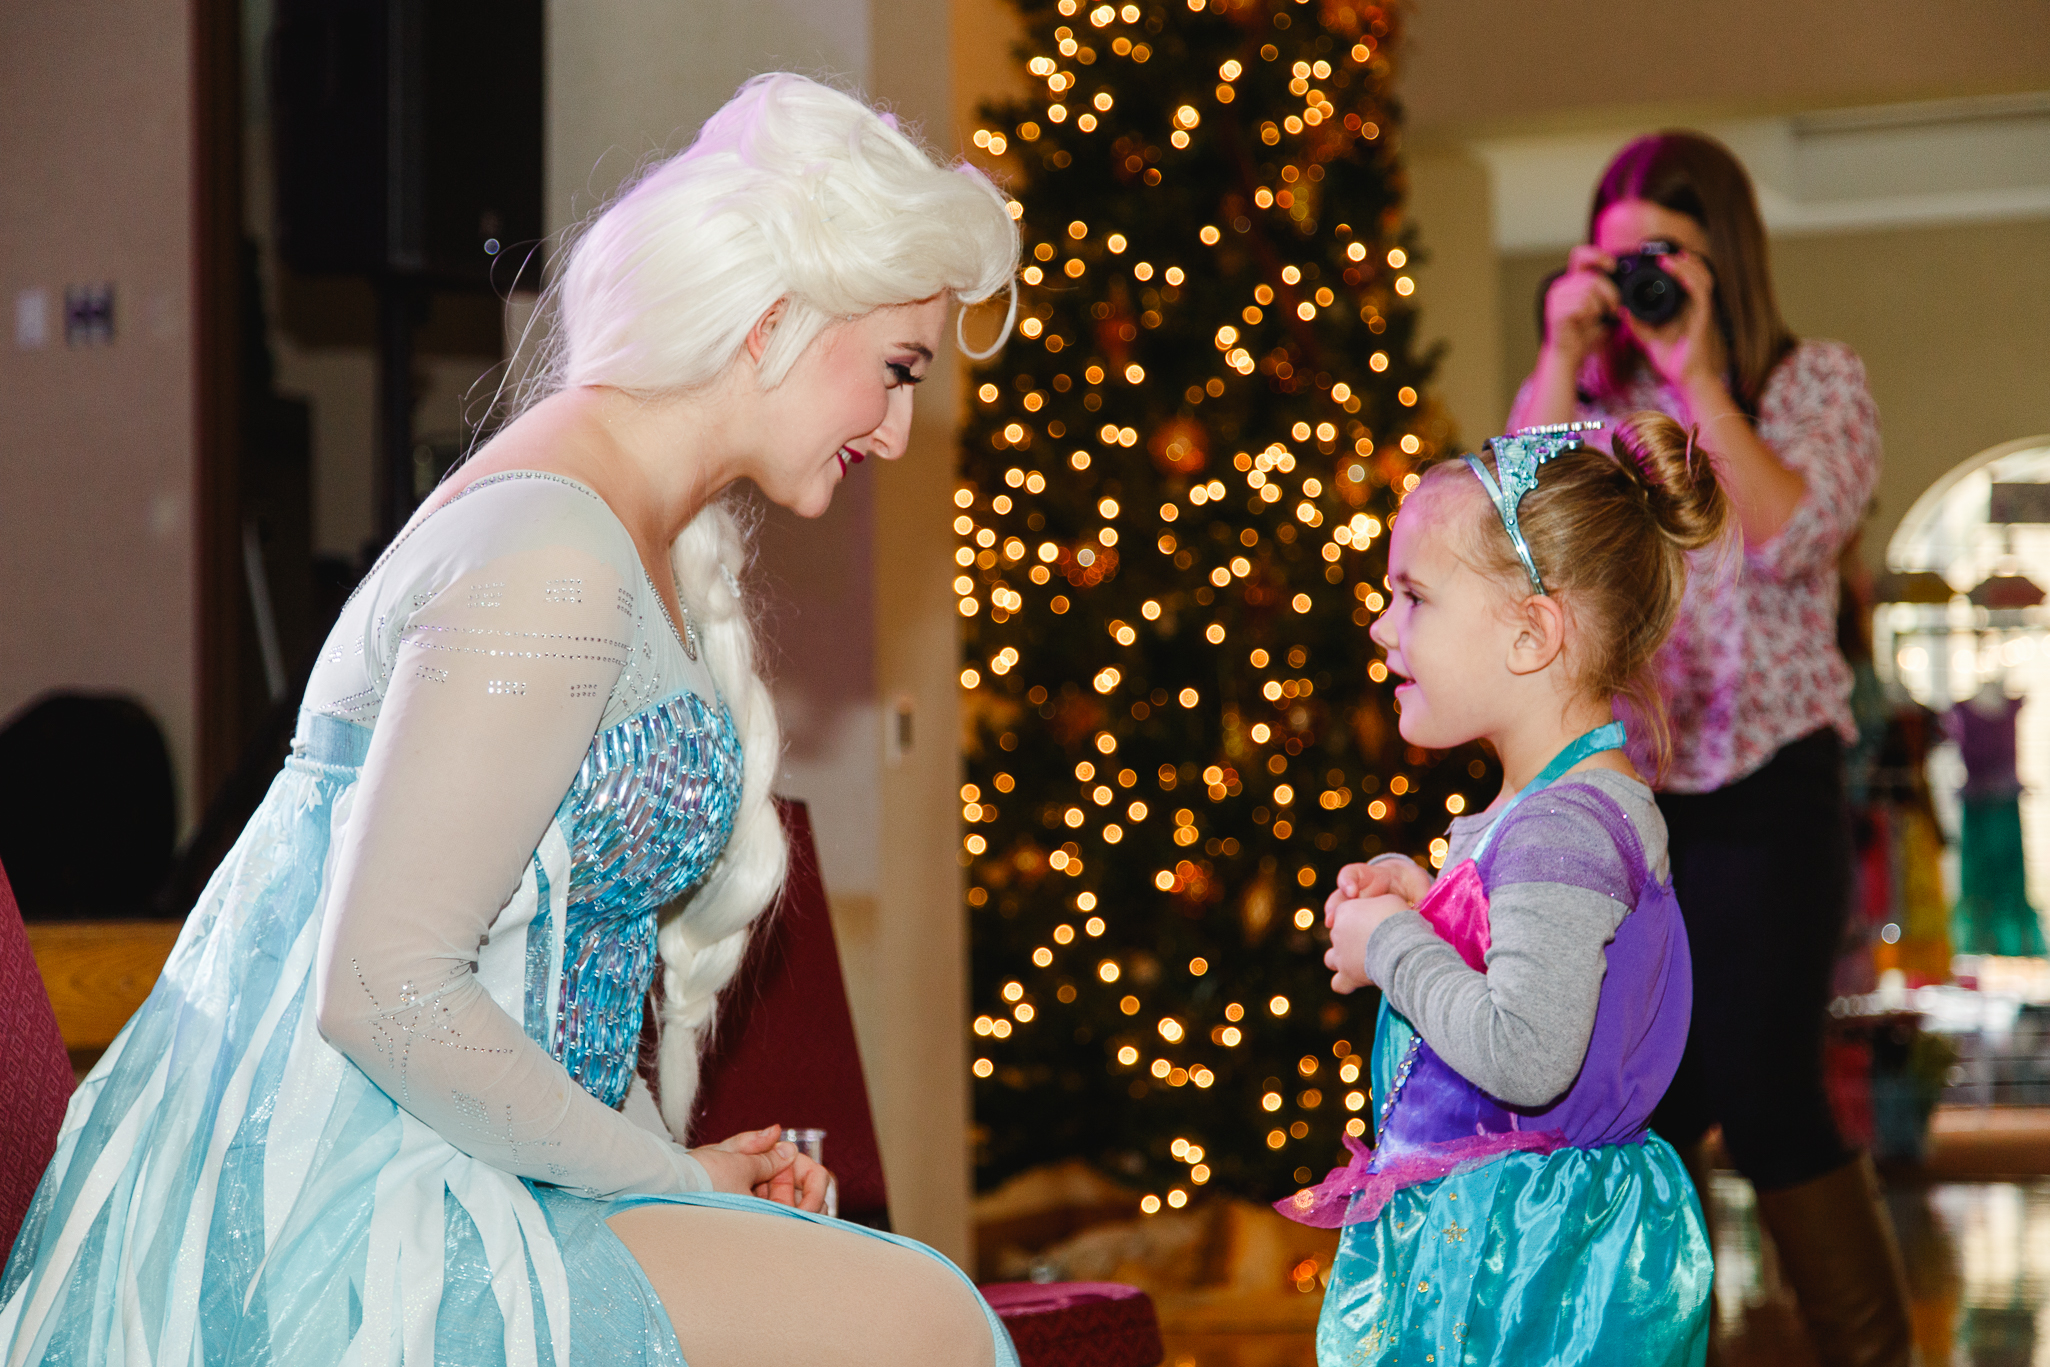 meet-princesses-columbus.jpg